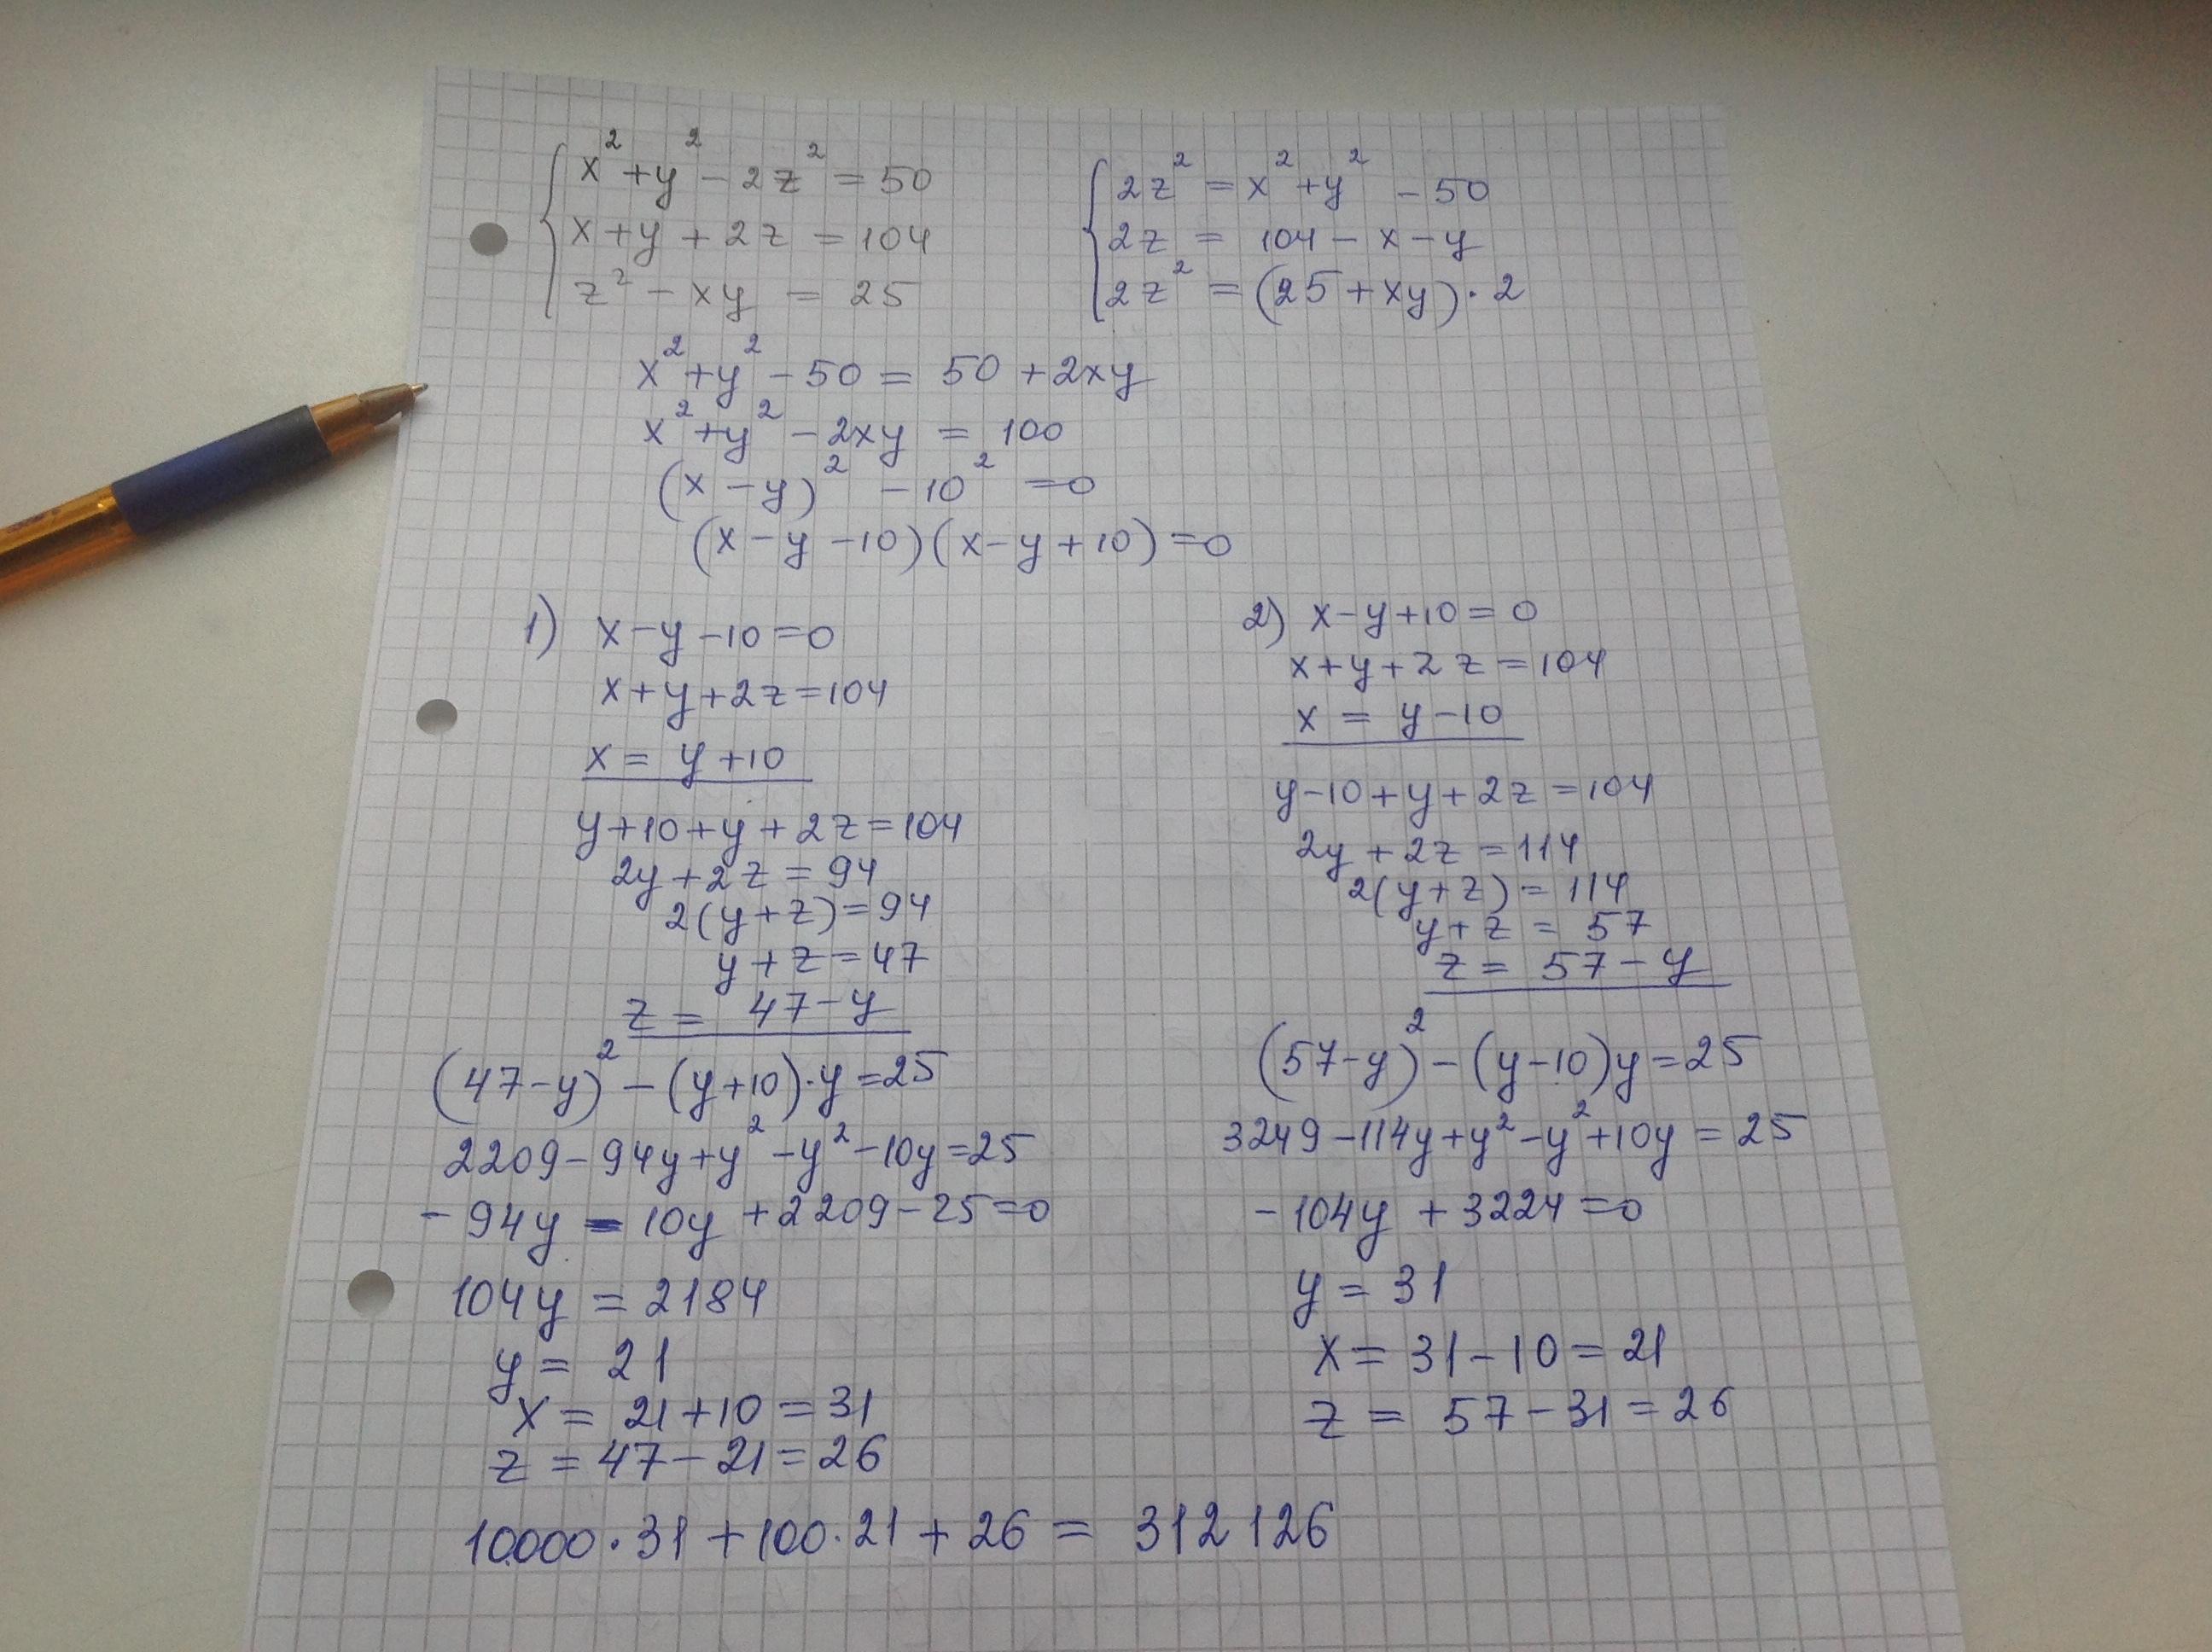 решение уравнений вида x2 a